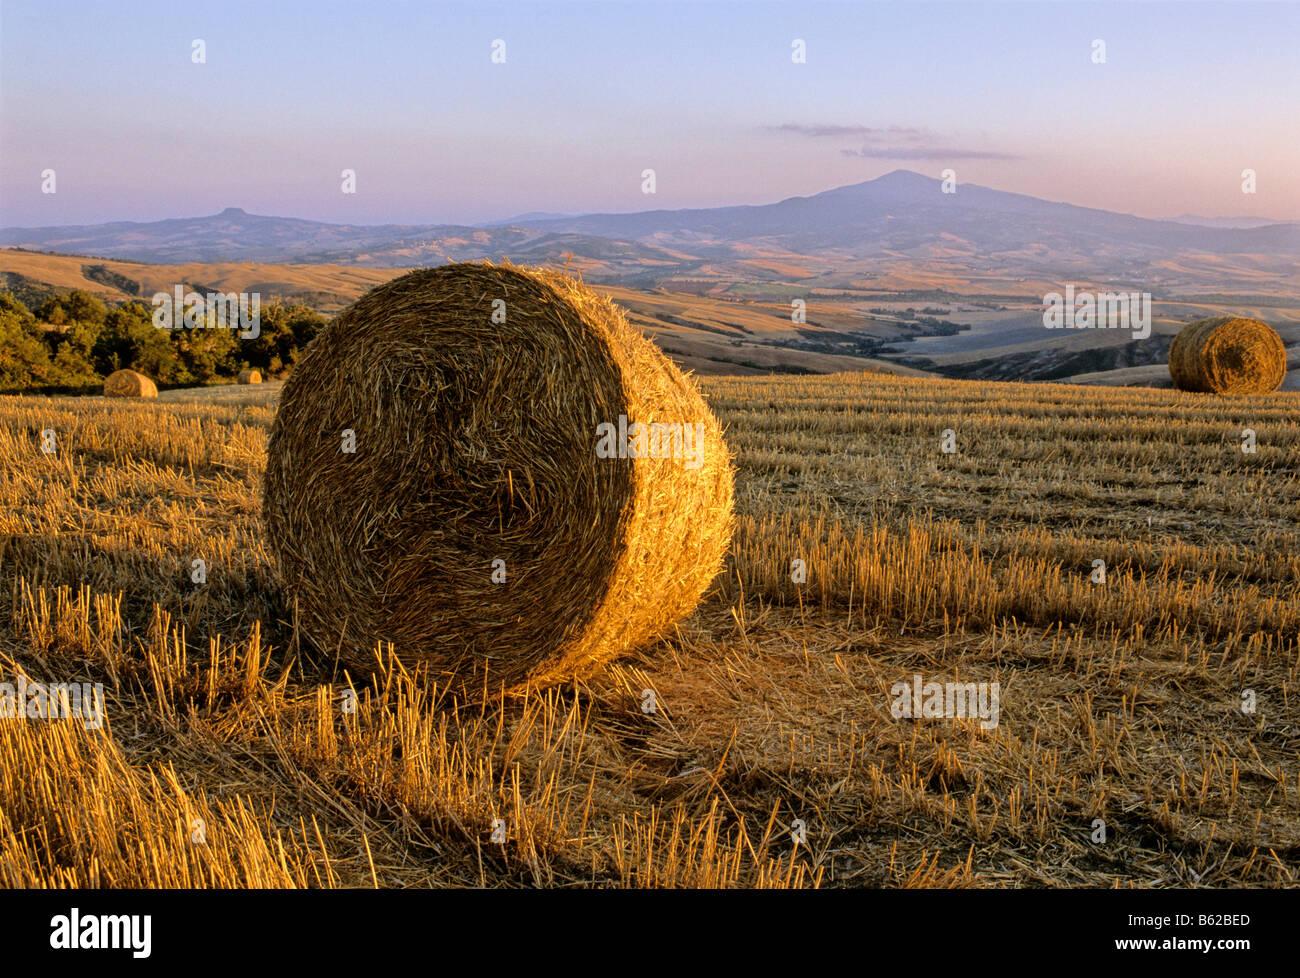 Bale of straw, harvested wheatfields, landscape around Radicofani and Monte Amiata at sunset, Val d' Orcia near - Stock Image